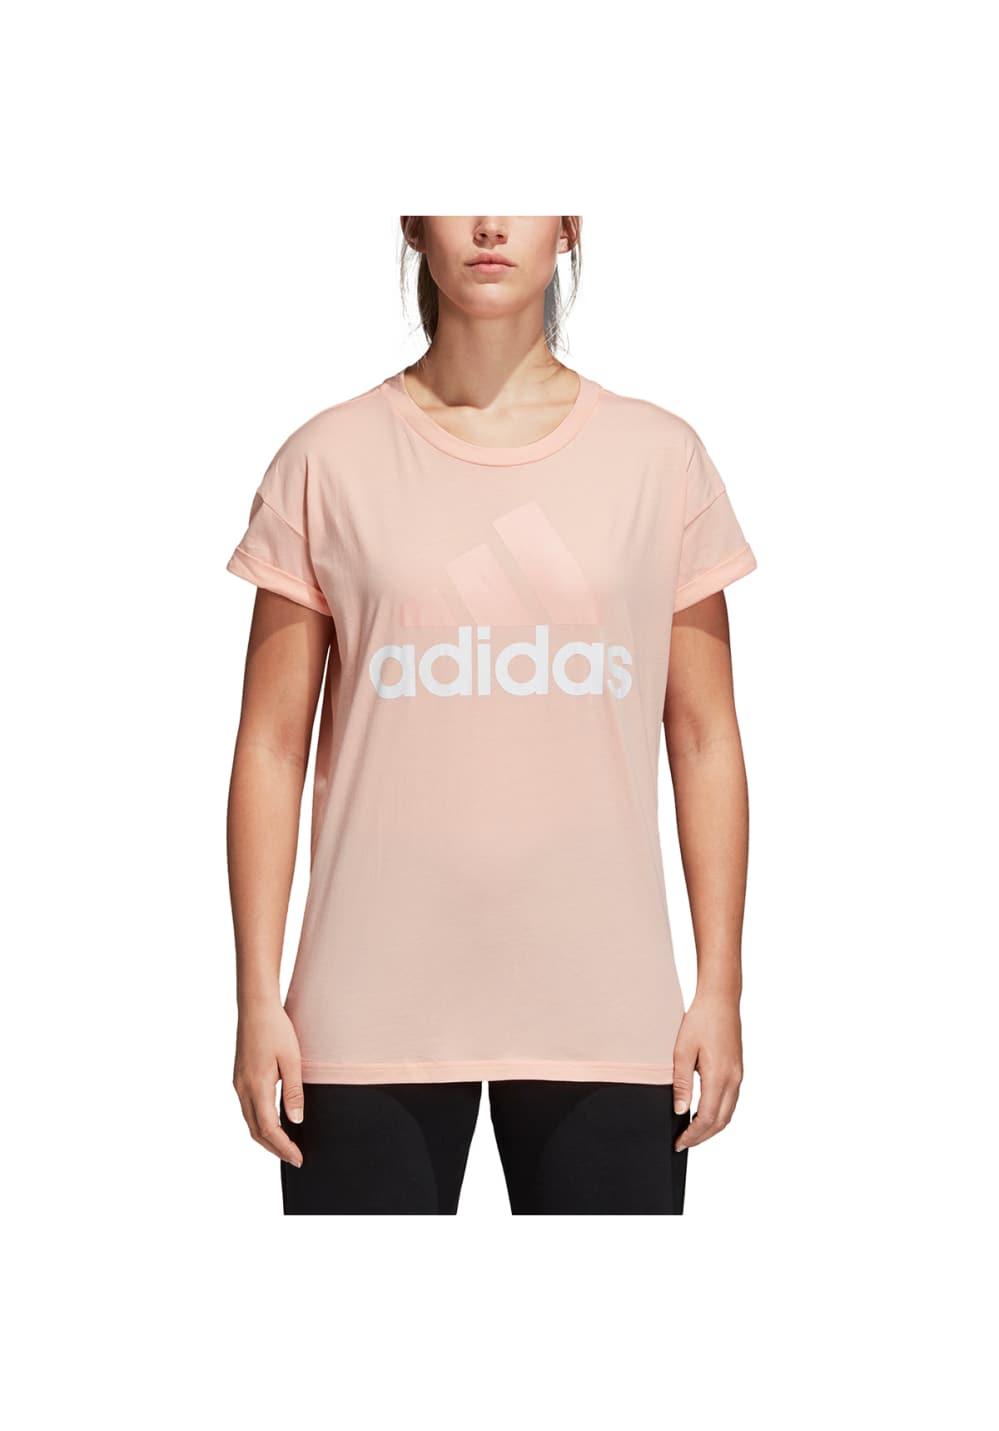 premium selection e790a 2c151 Next. -60%. adidas. Essentials Linear Loose Tee - Maillot fitness pour Femme.  Prix normal ...